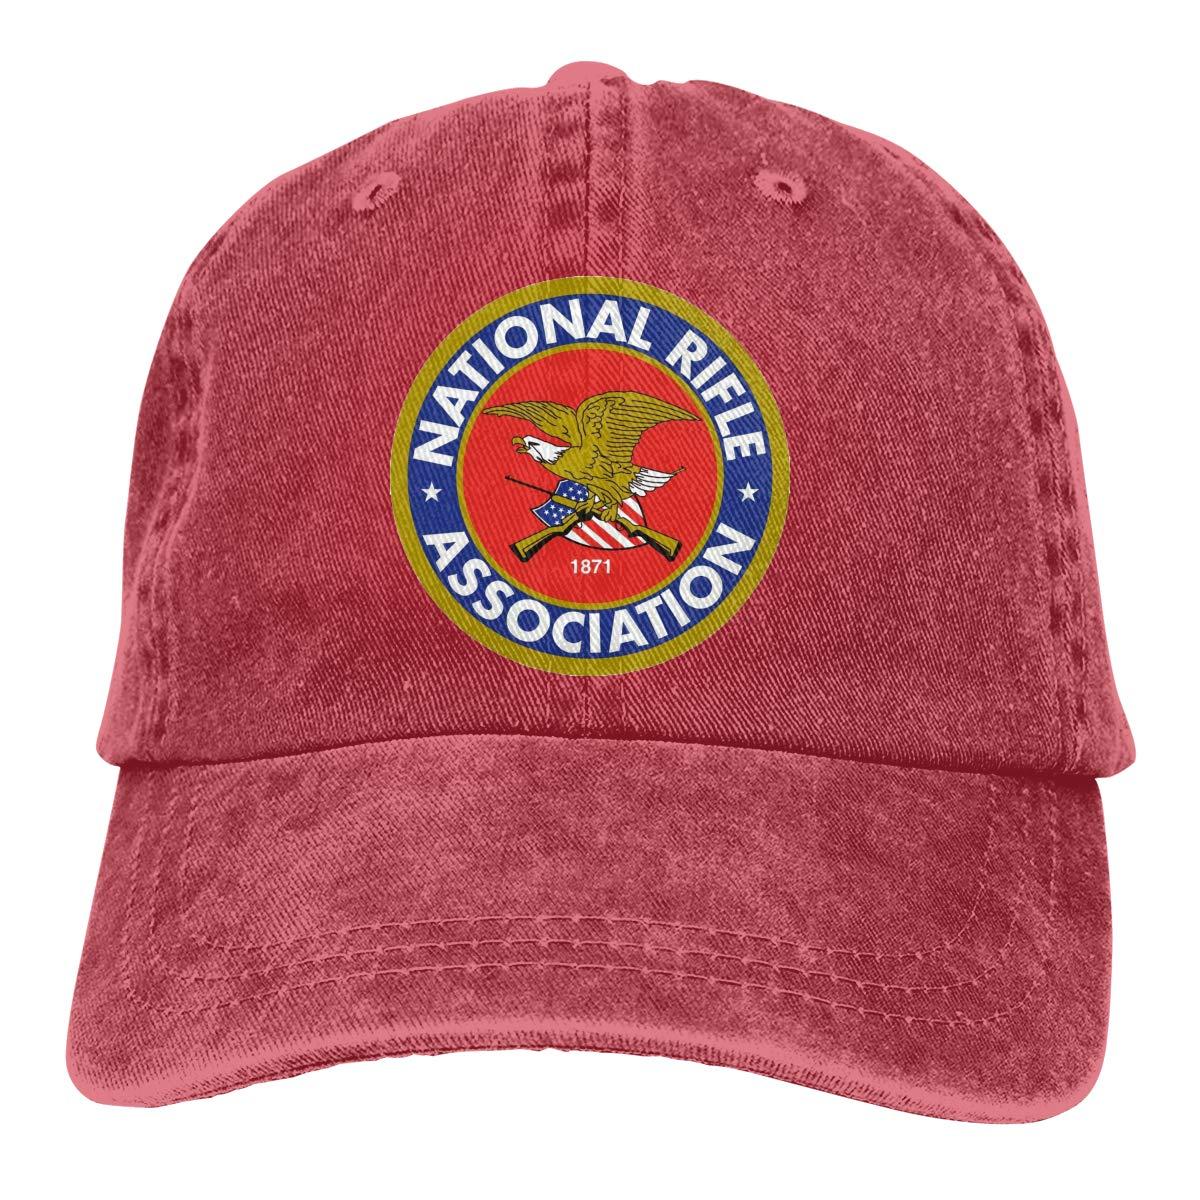 TBVS 77 Men Women Distressed Cotton Denim Baseball Cap NRA Life Member Plain Cap